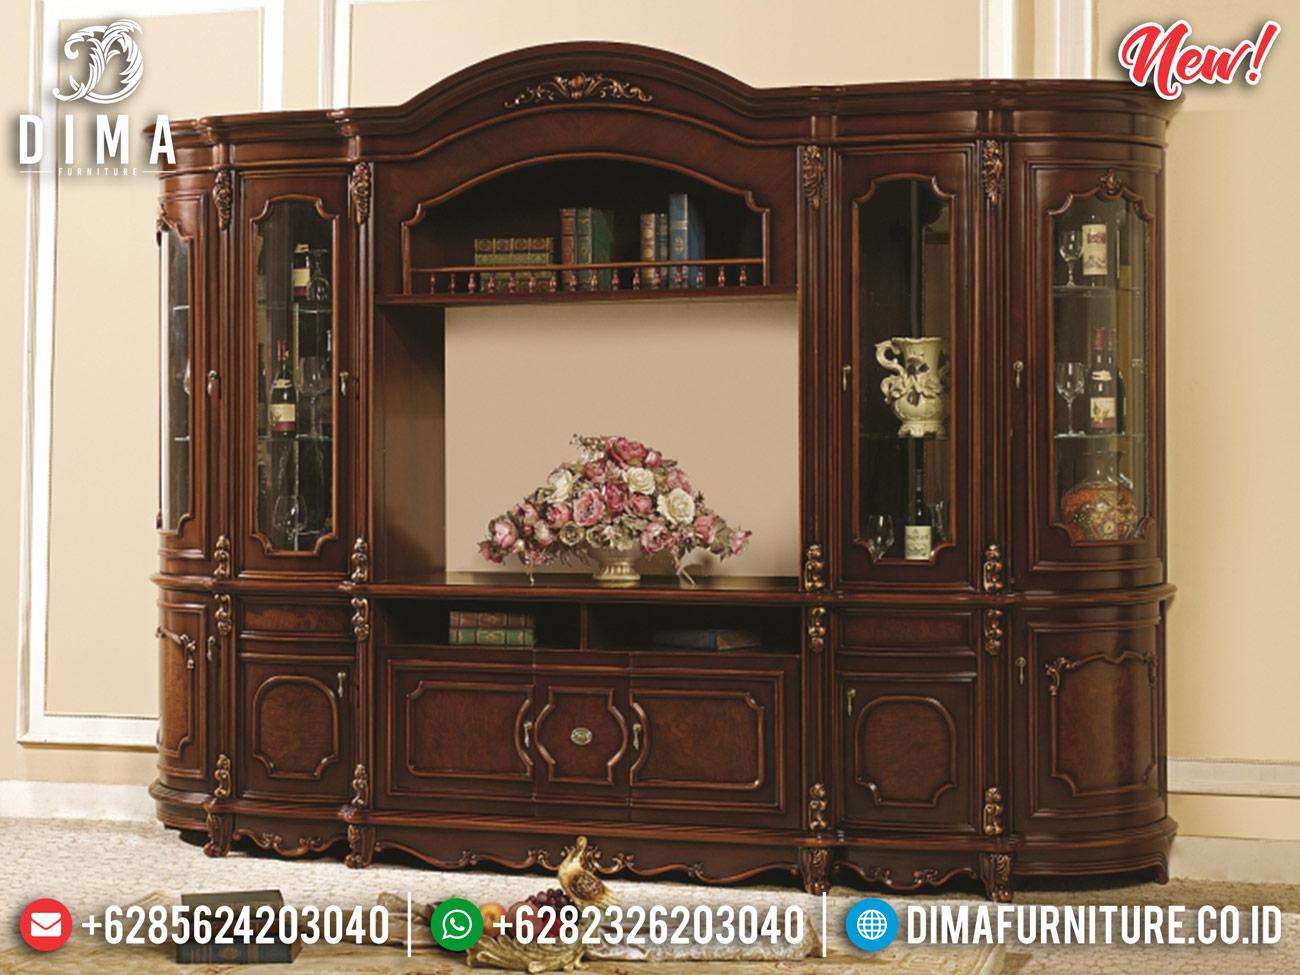 Superior Bufet TV Mewah Ukiran Jati Natural Luxury Carving Jepara MMJ-0829